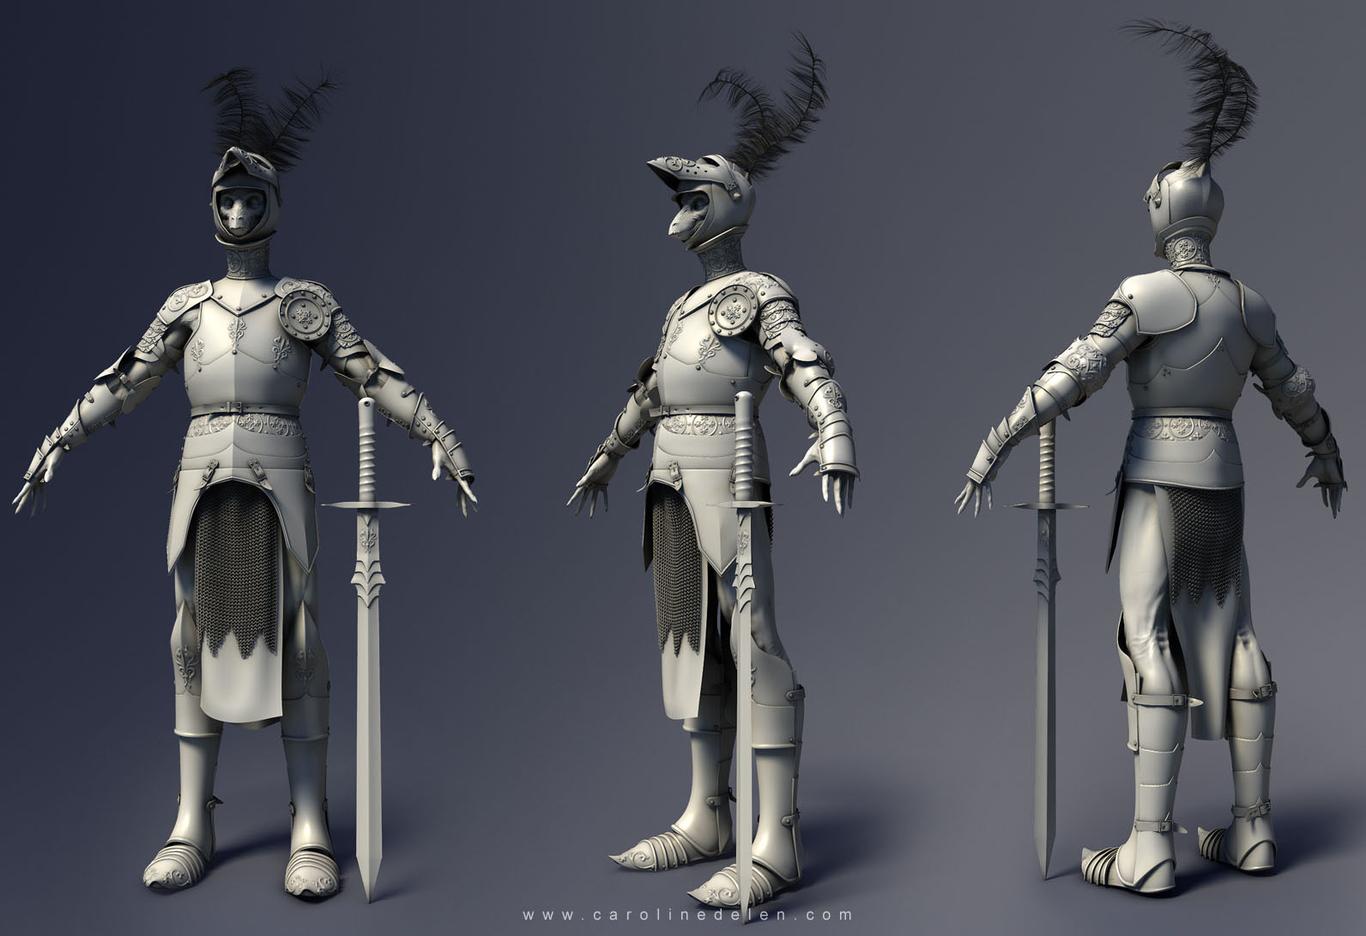 Ether knight 1 de1f161d gvbk